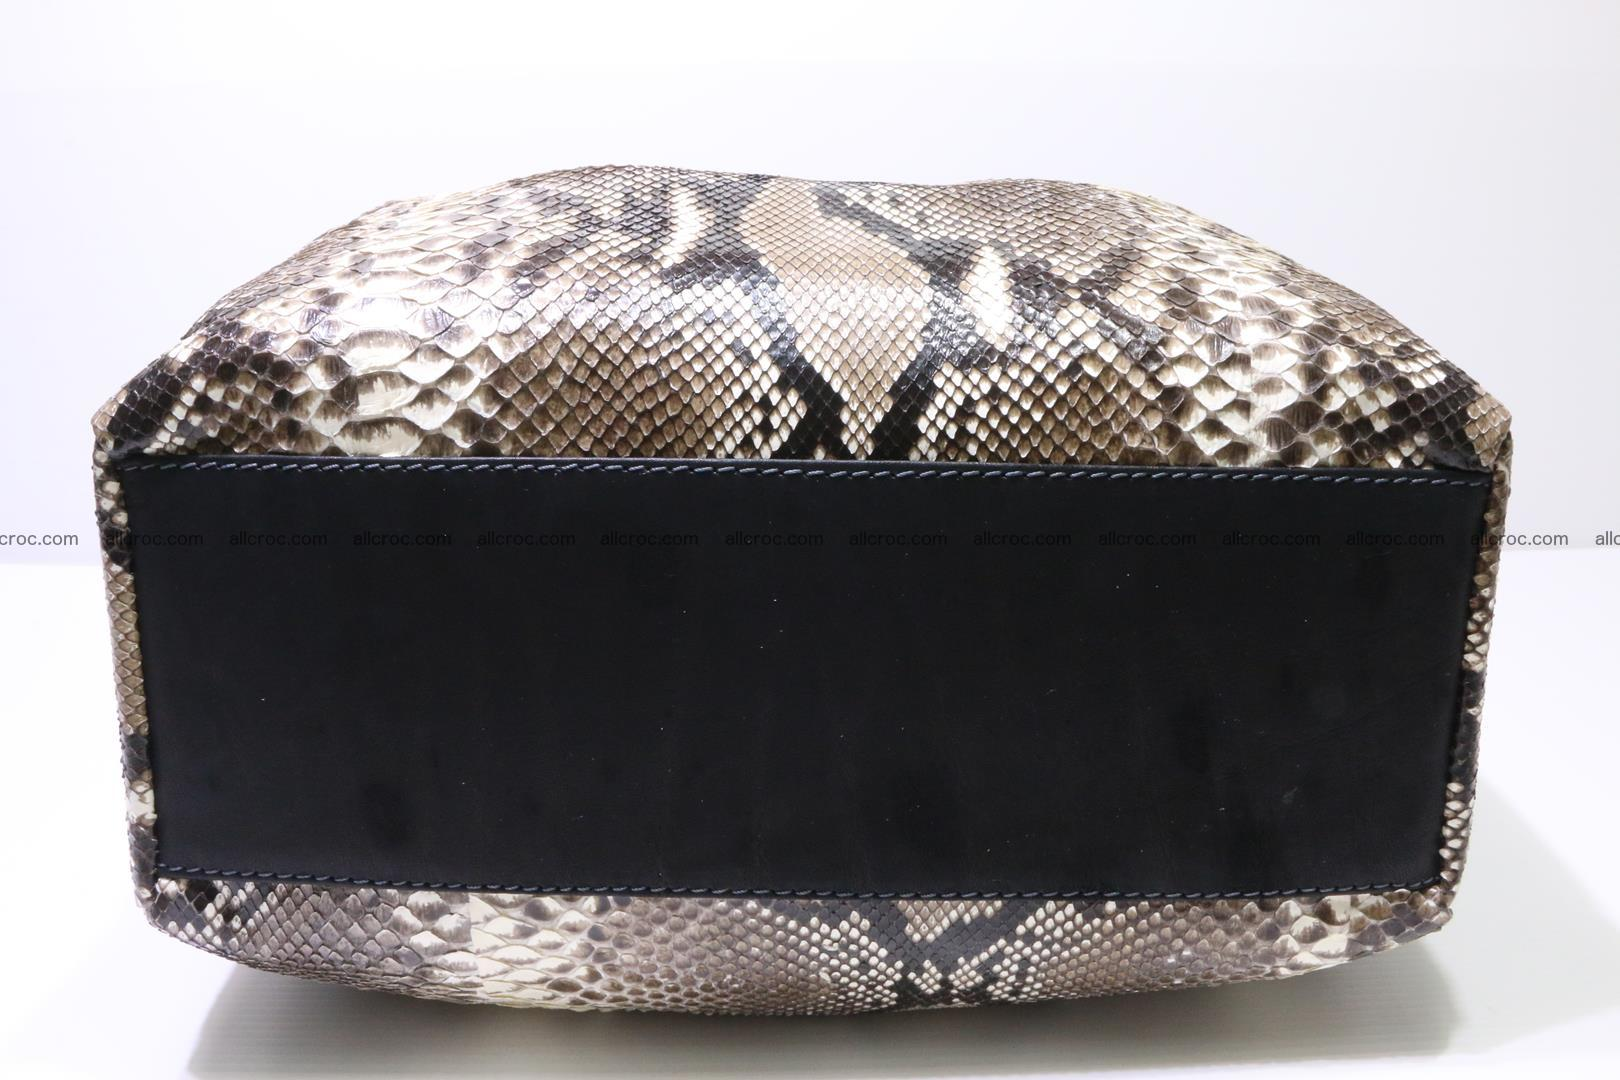 Python skin handbag for lady from genuine Python skin 202 Foto 6